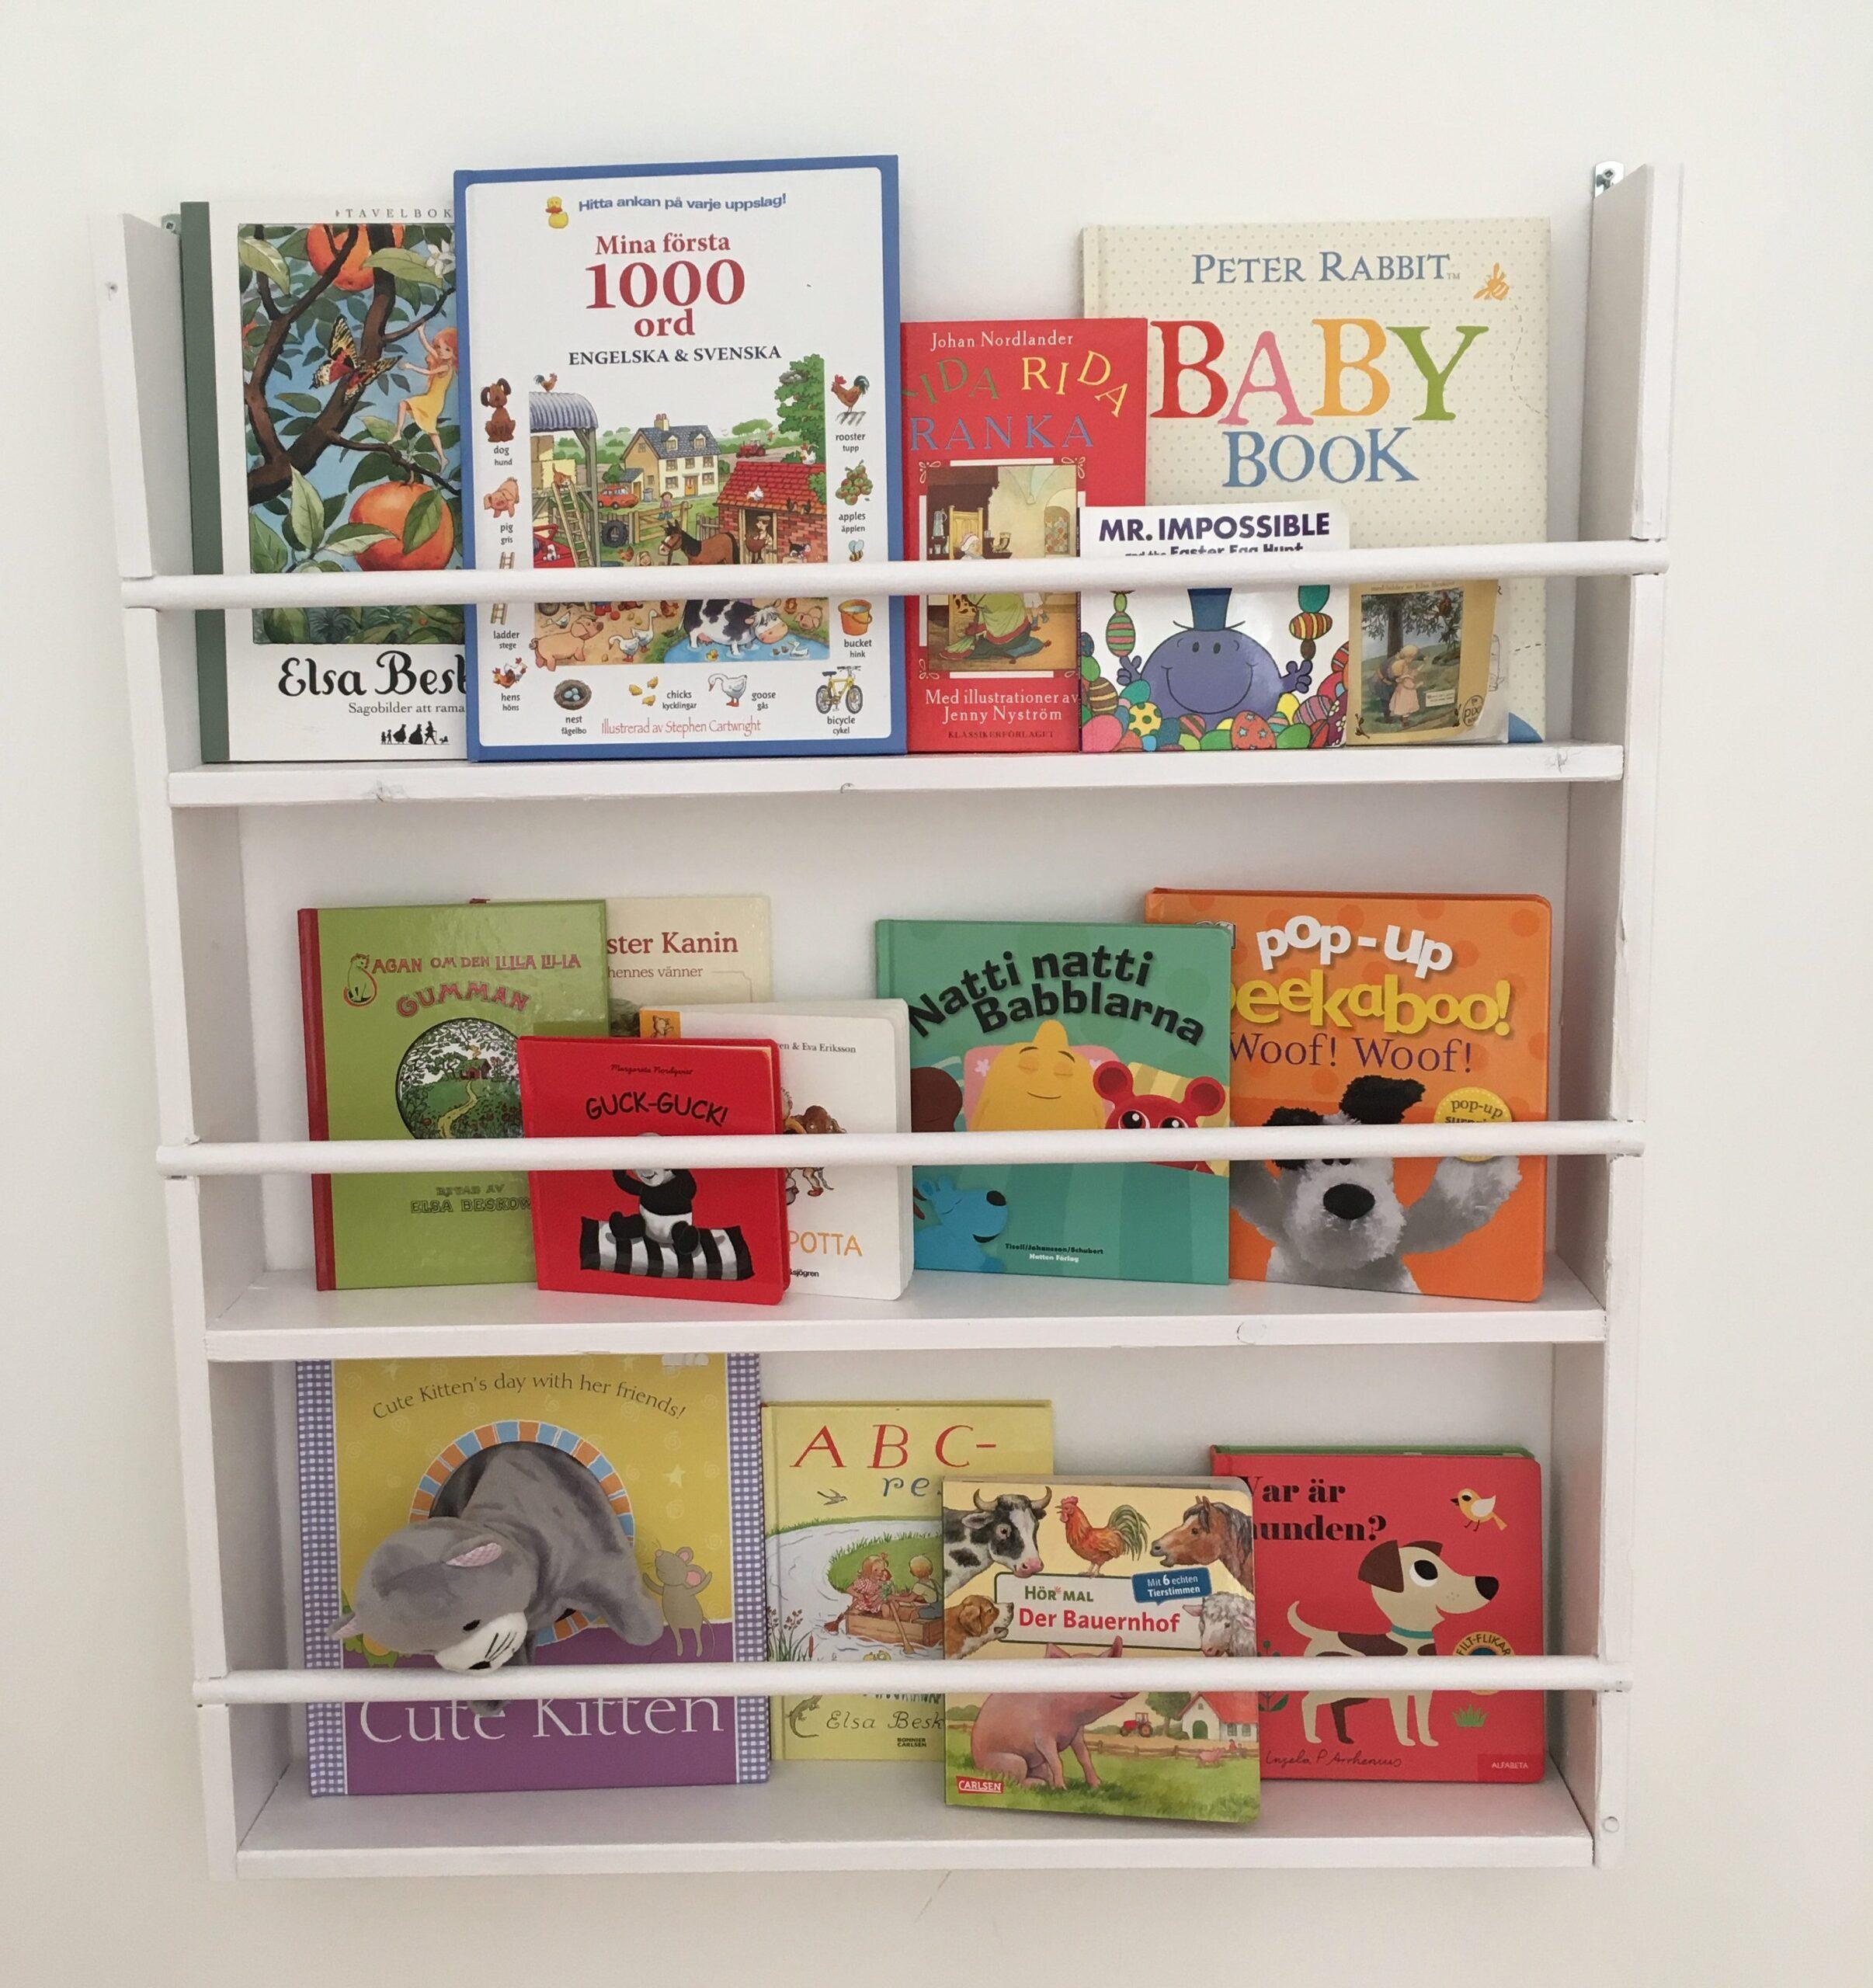 Full Size of Kinderzimmer Bücherregal Buchregal Fr Das Schwedisches Leben Regale Sofa Regal Weiß Kinderzimmer Kinderzimmer Bücherregal